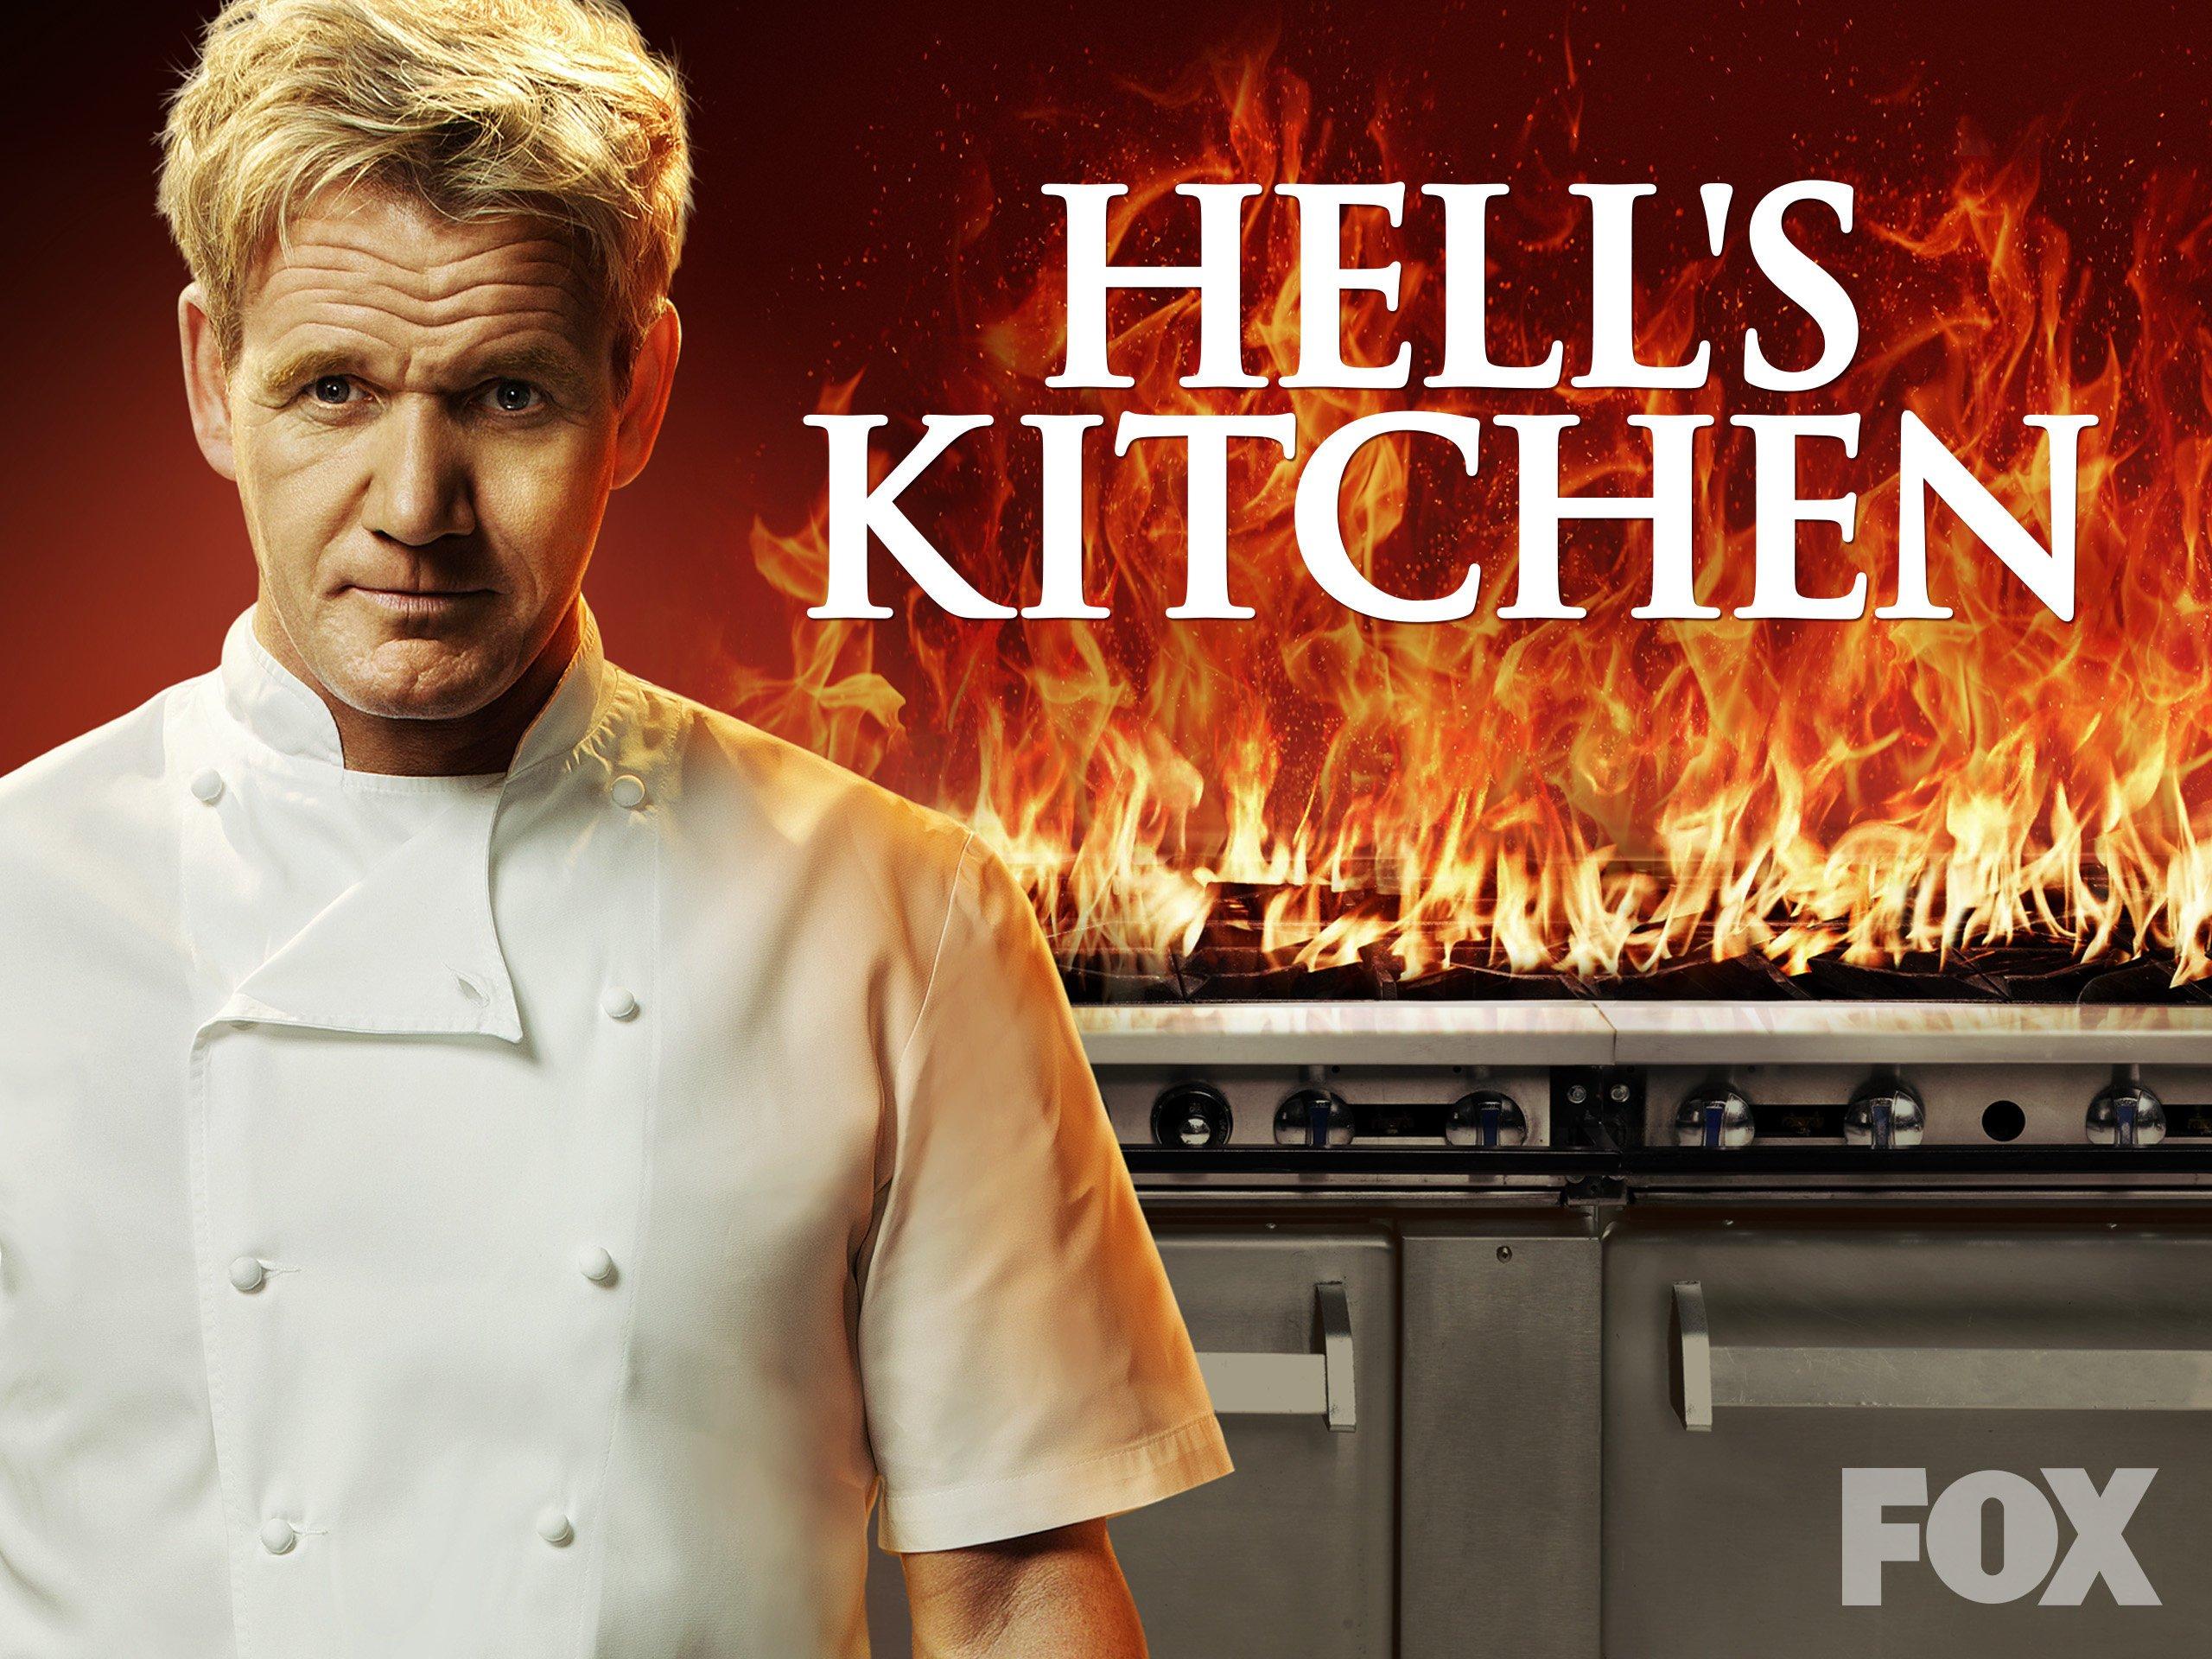 Hells Kitchen Fondo De Pantalla Hd Fondo De Escritorio